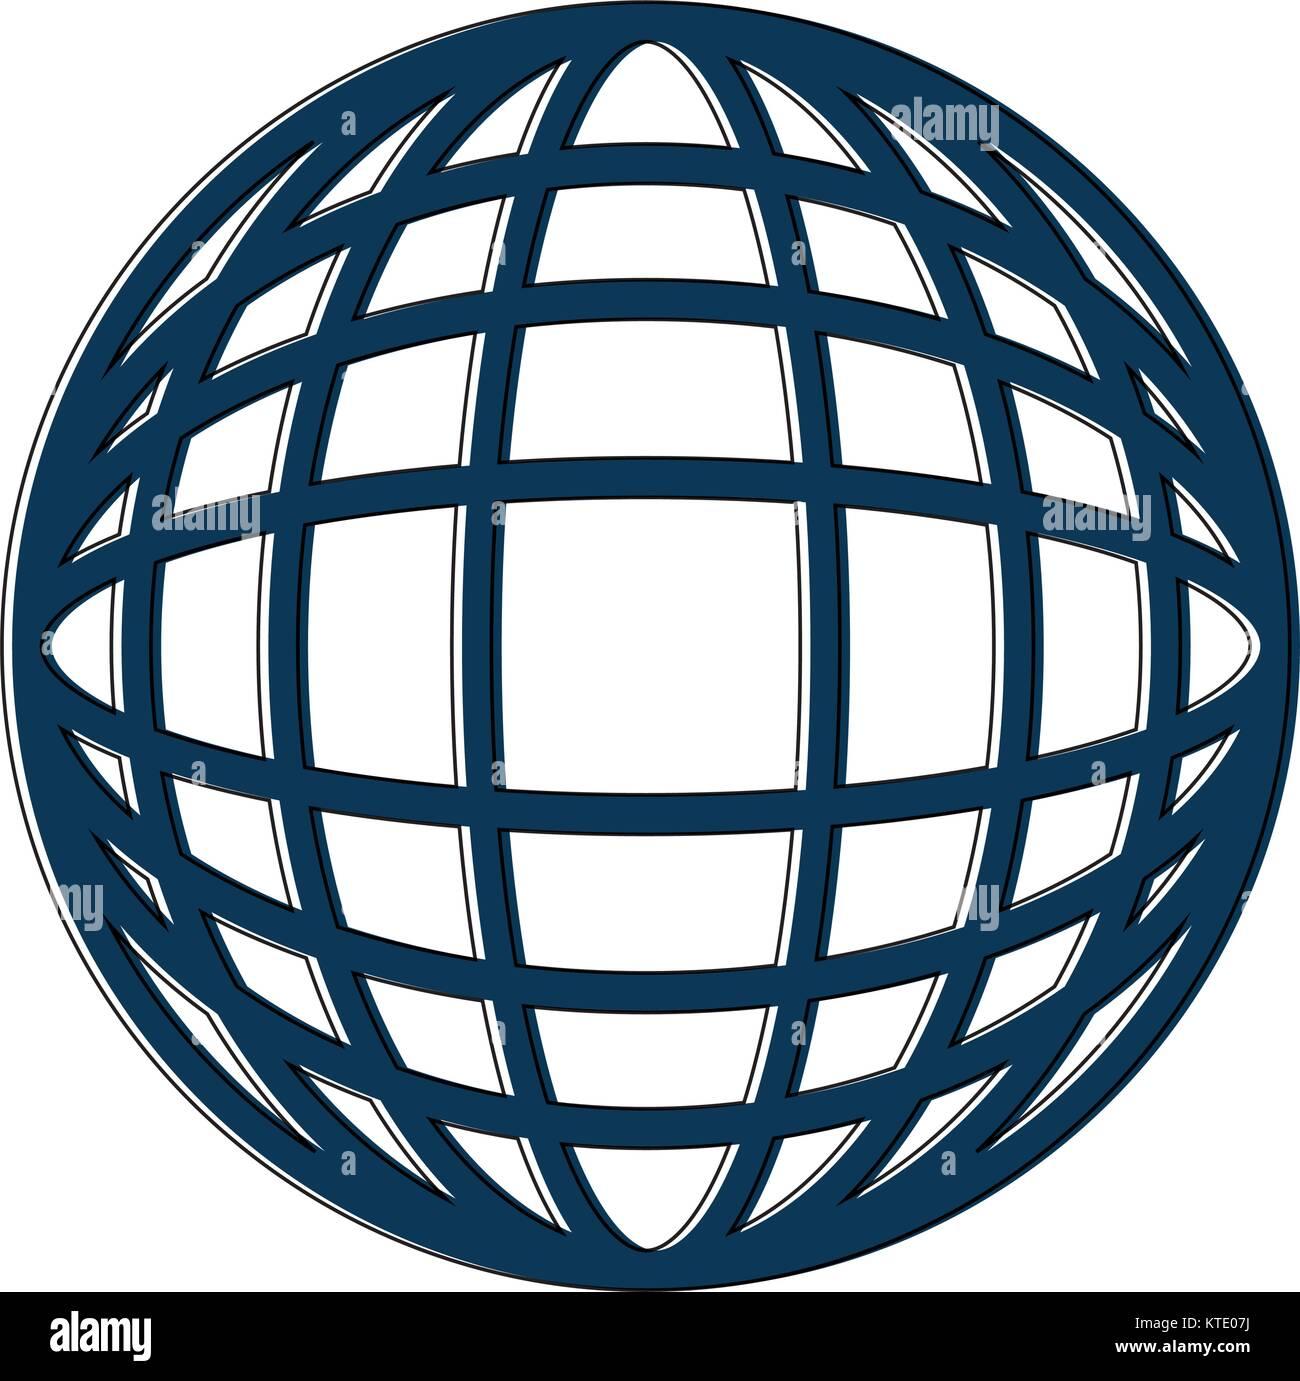 hight resolution of earth globe diagram icon image vector illustration design stock image